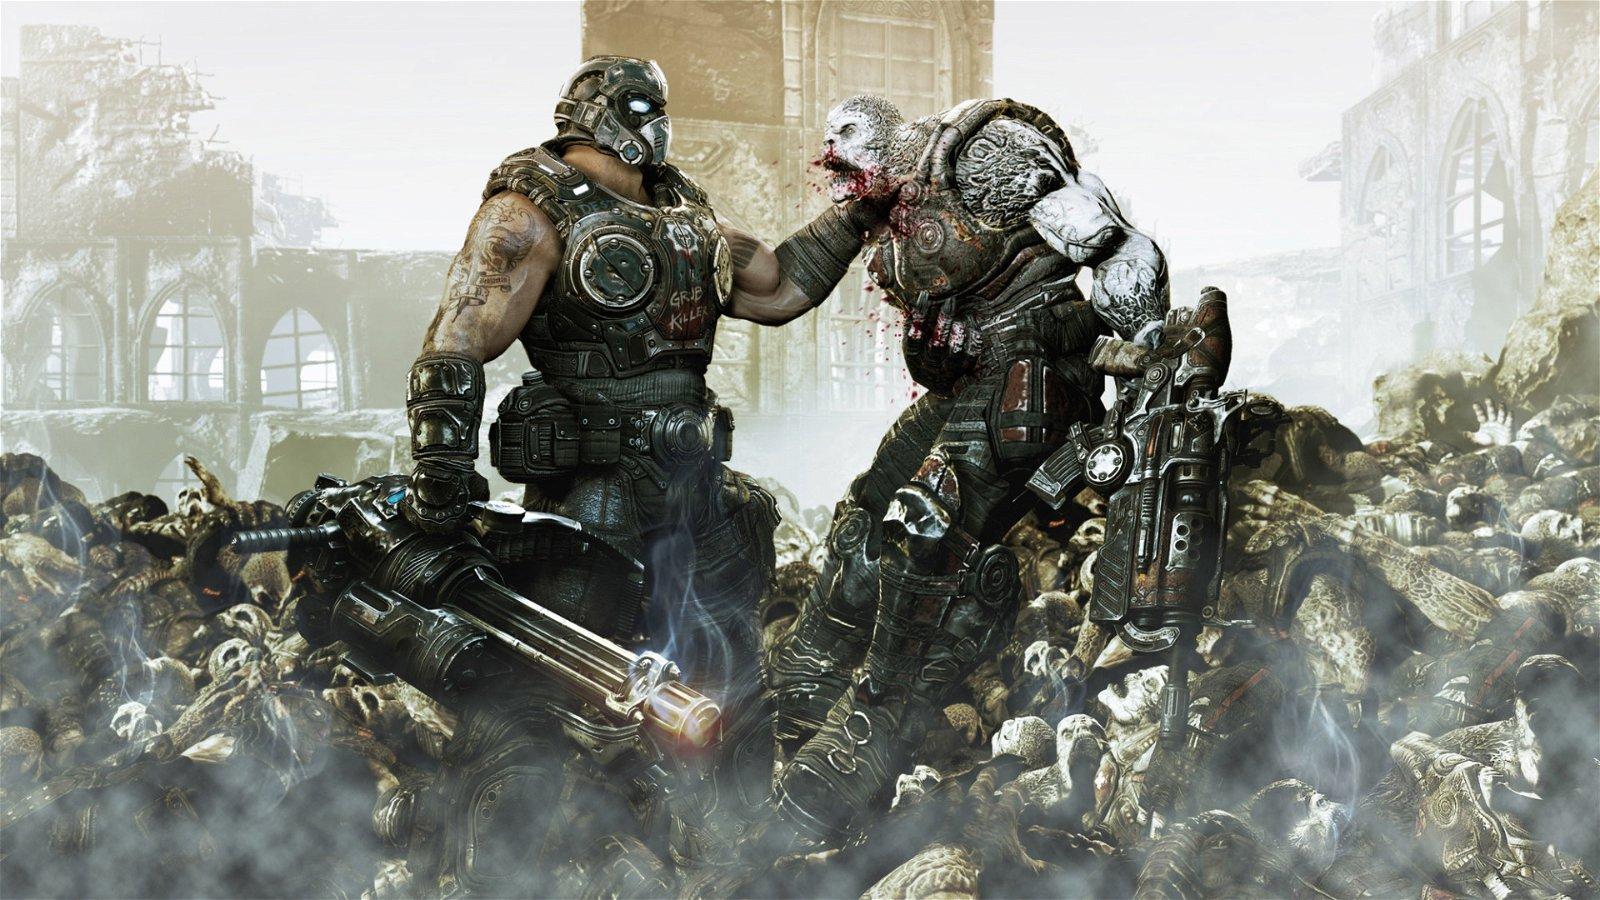 Gears of War 4 Brings the Horde Back to Multiplayer 1